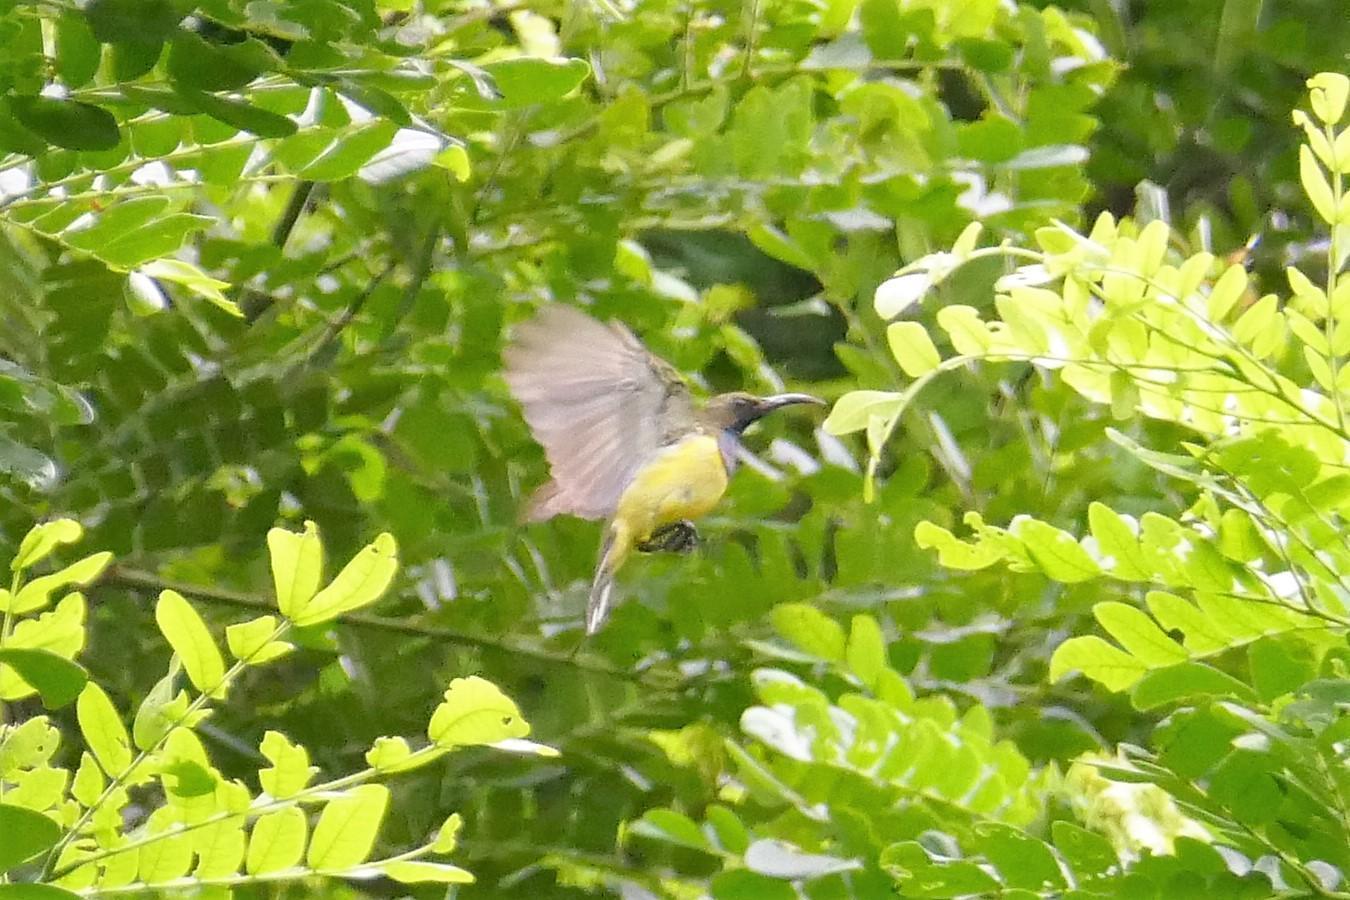 Olive-backed Sunbird Photo by Ronald Tanco